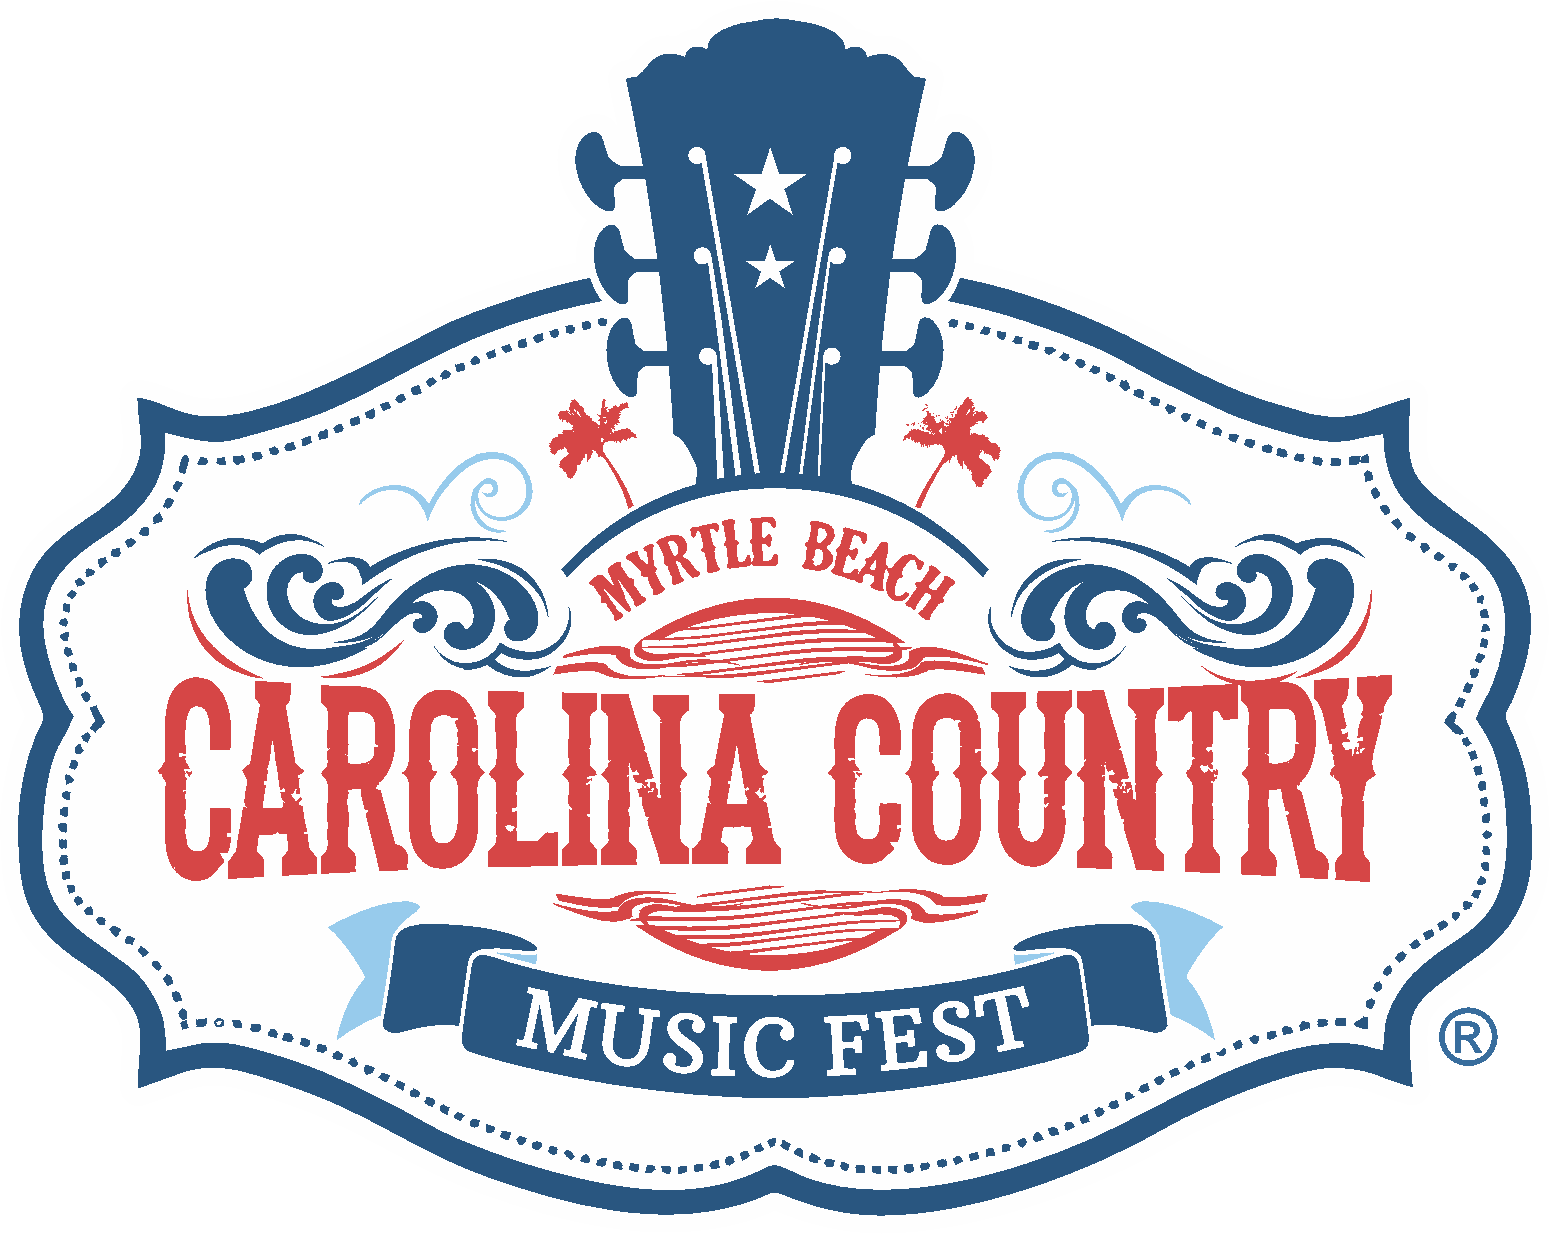 Best Music Festivals 2020 Carolina Country Music Fest | June 4   7, 2020 | Myrtle Beach, SC